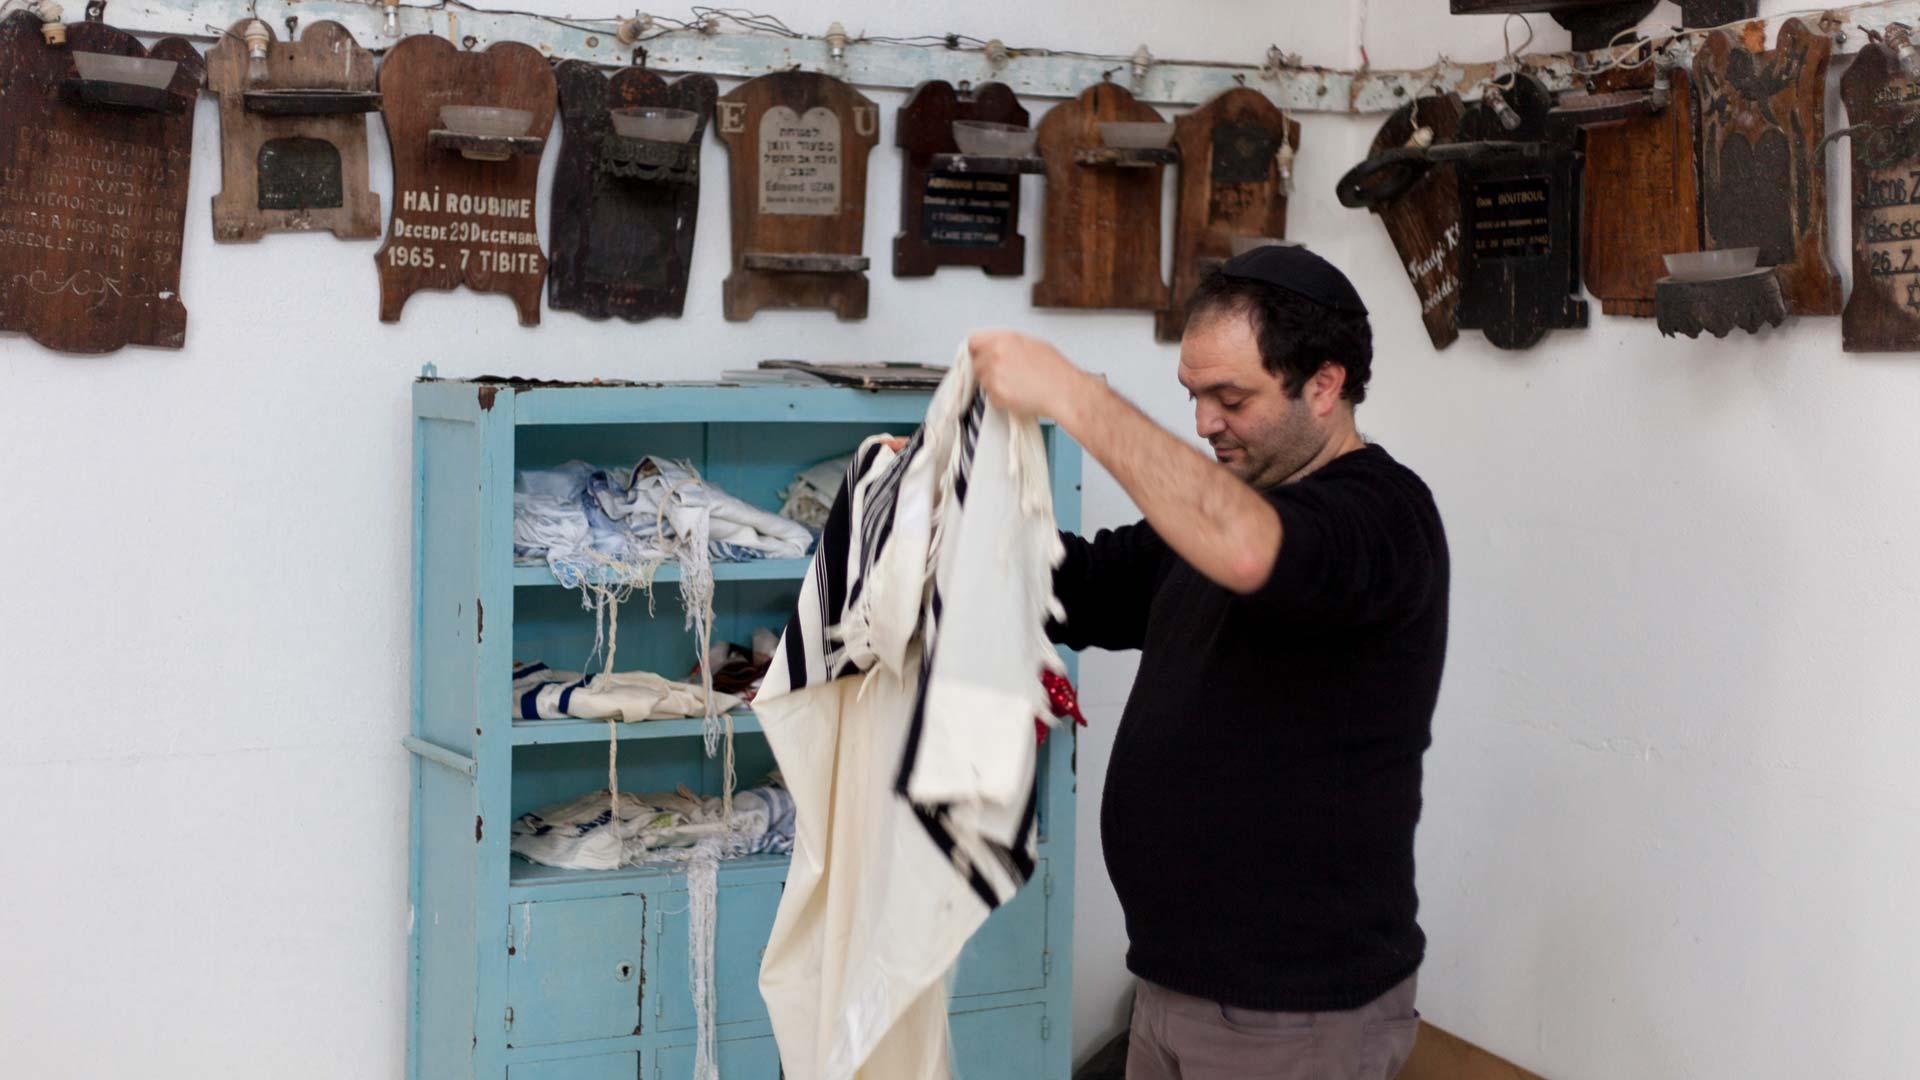 01-portrait-yves-tunisien-juif-priere1-inkyfada